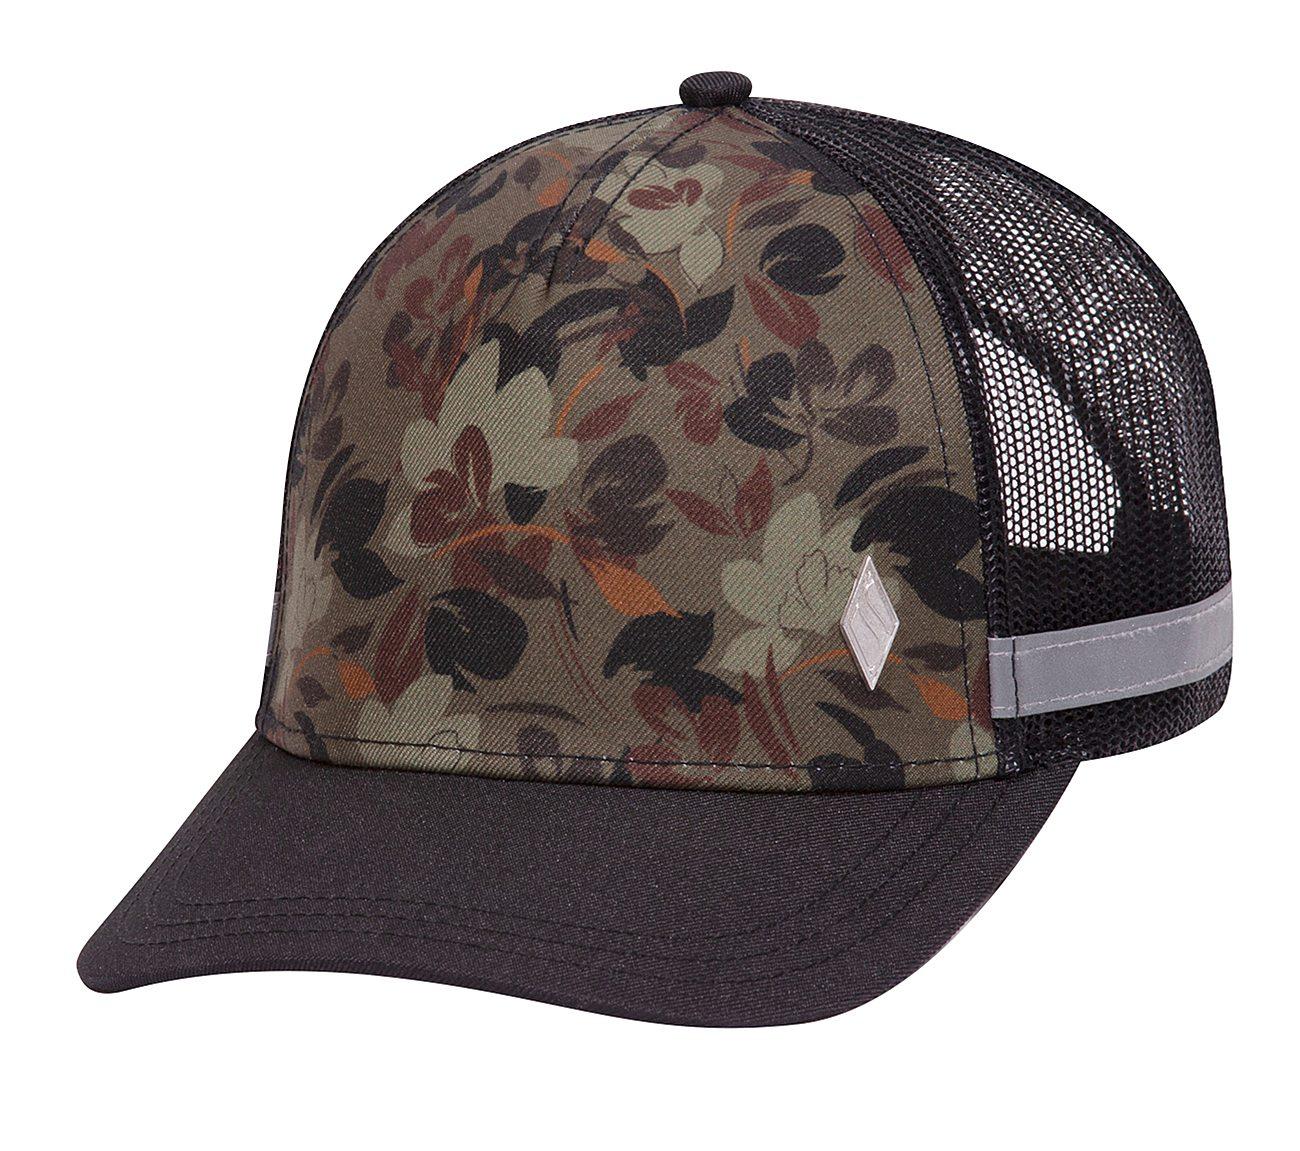 Camo Floral Trucker Hat